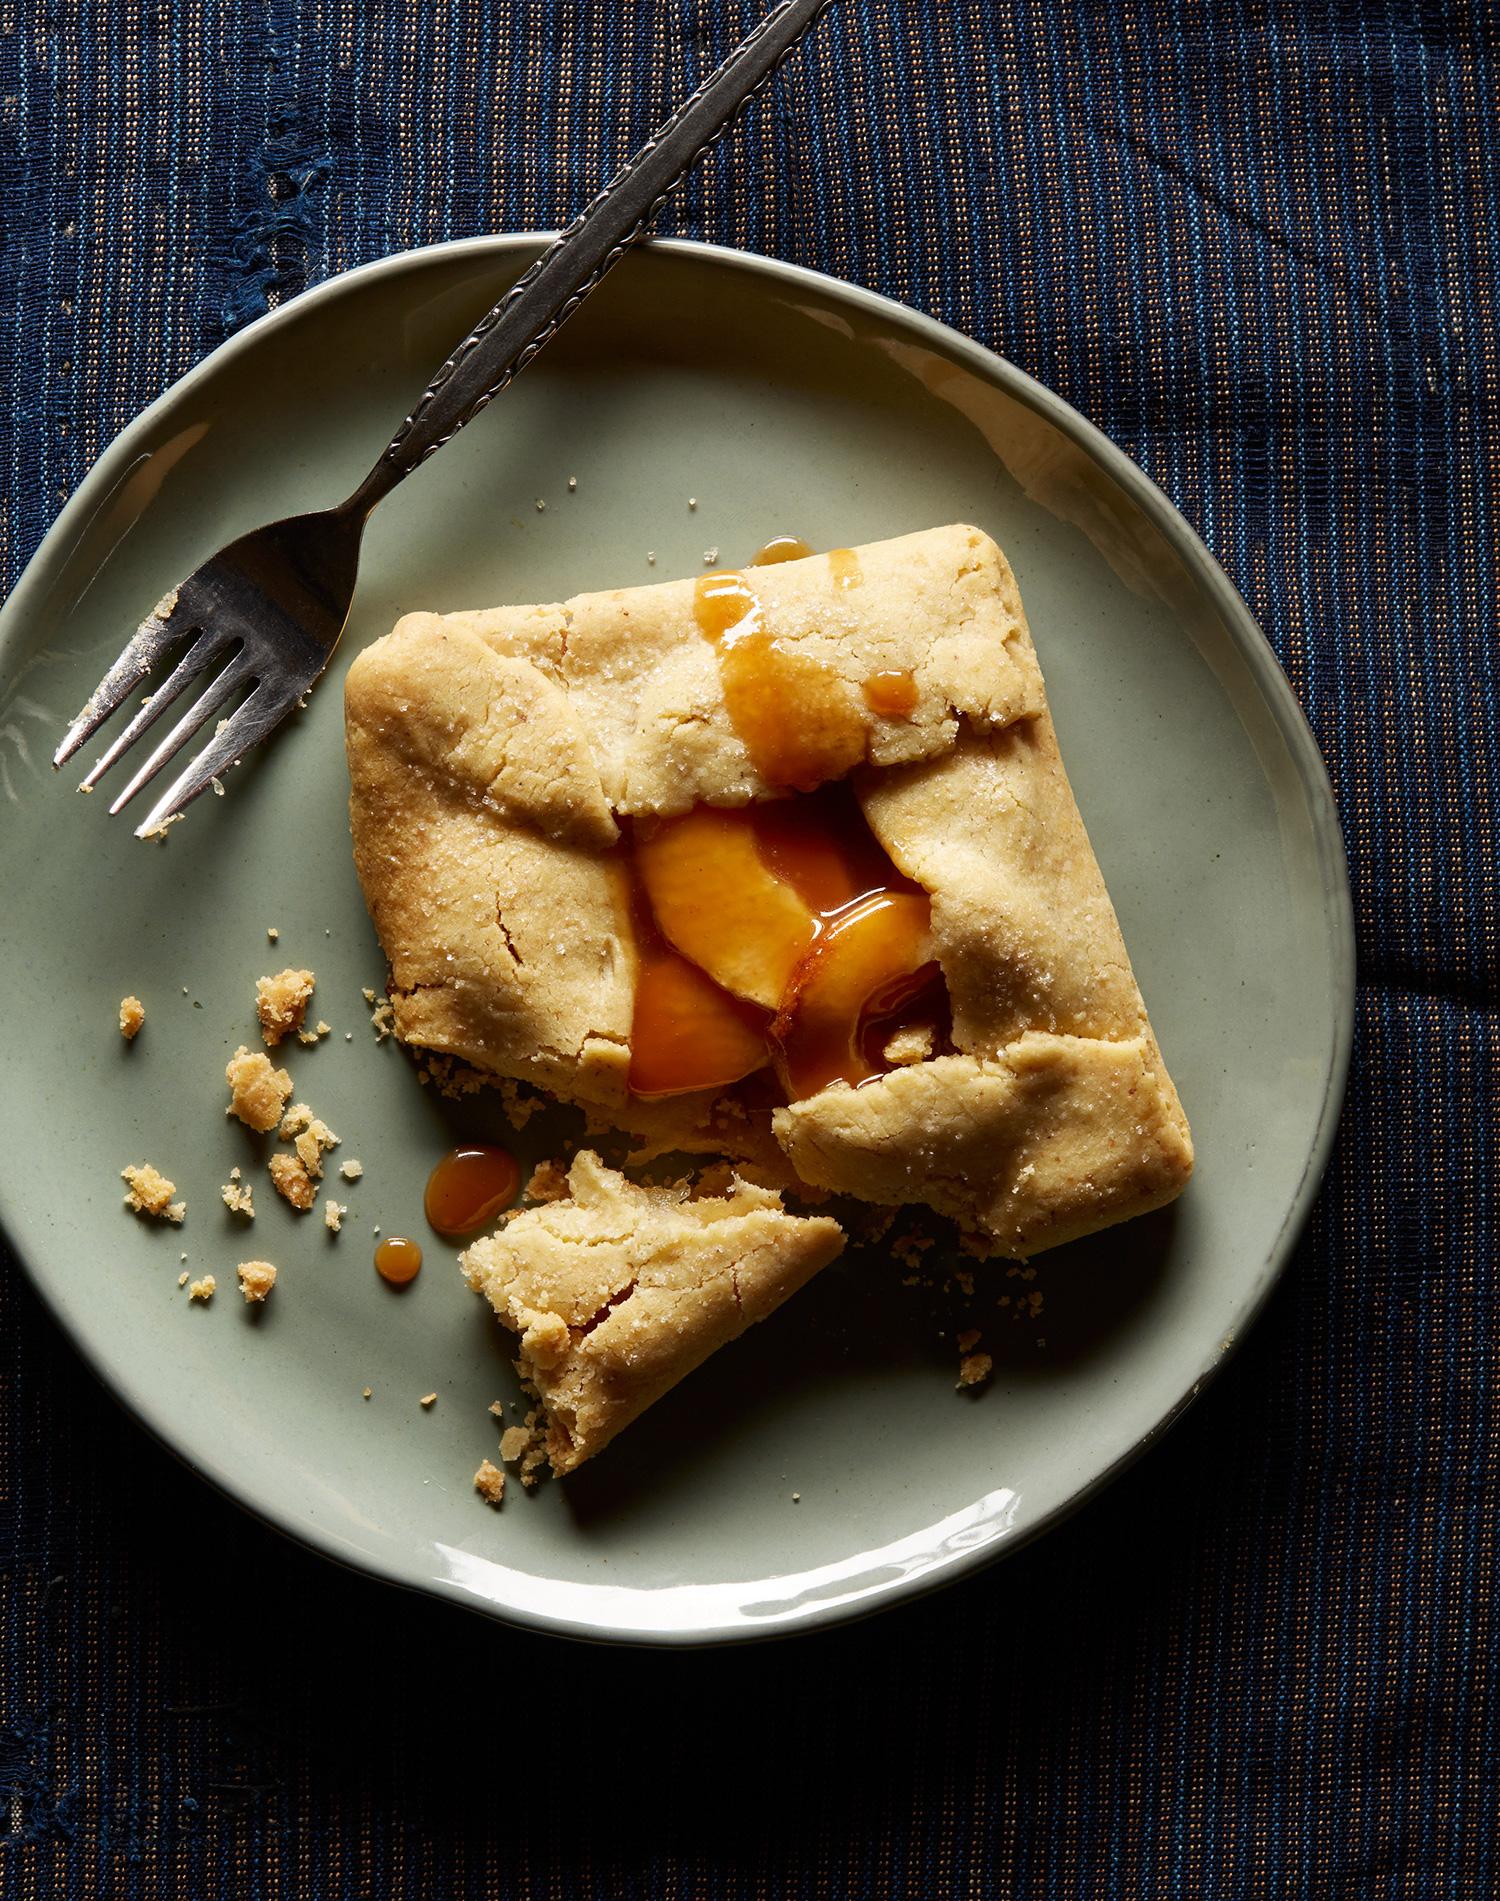 apple Crostada with Carmel sauce gluten free pie crust